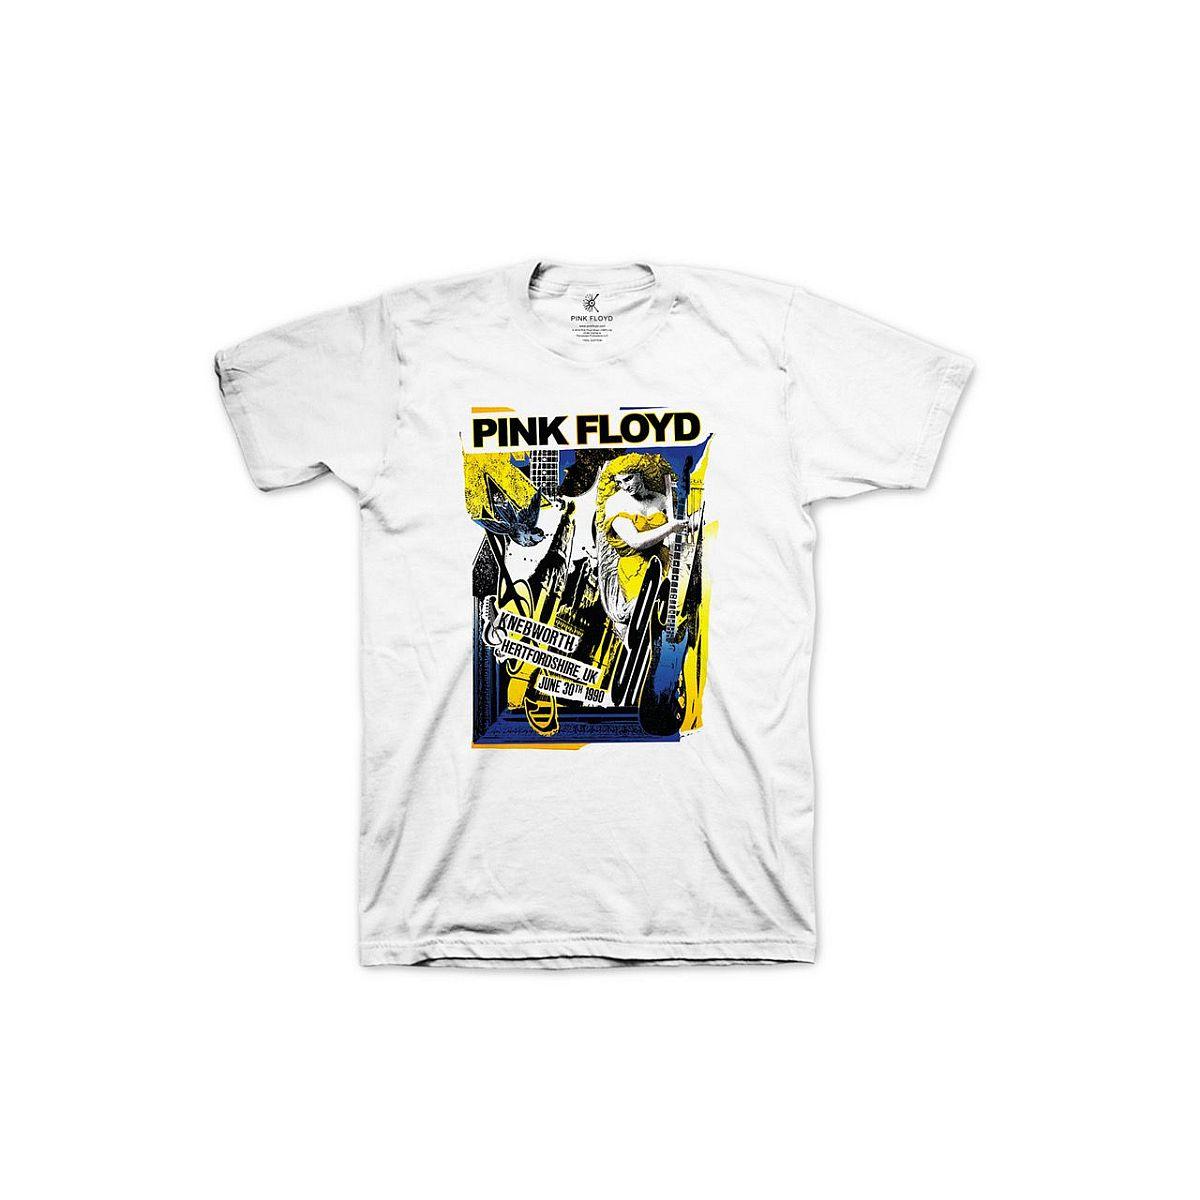 Pink Floyd Live at Knebworth 1990 White T-Shirt